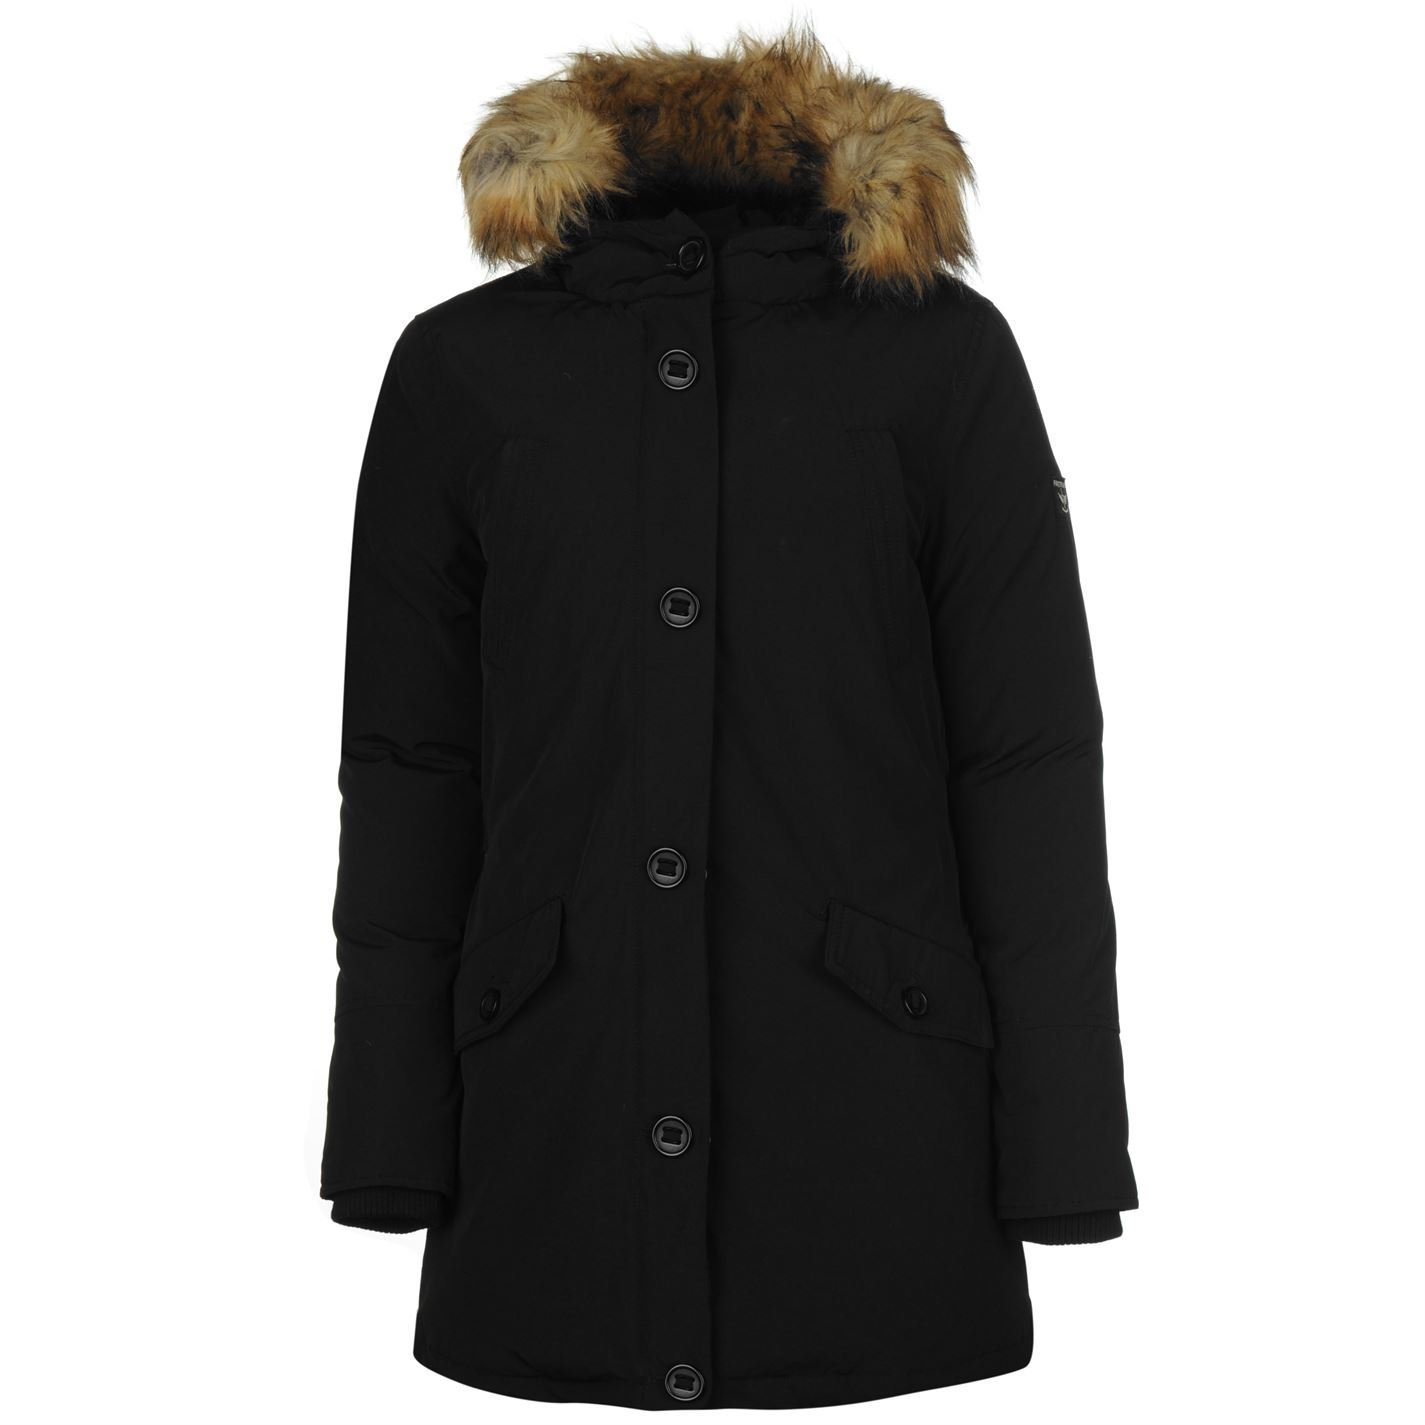 Firetrap Down Parka chaqueta para mujer Black Coat Ropa Chaquetas y abrigos, negro, UK 8 (XSmall)